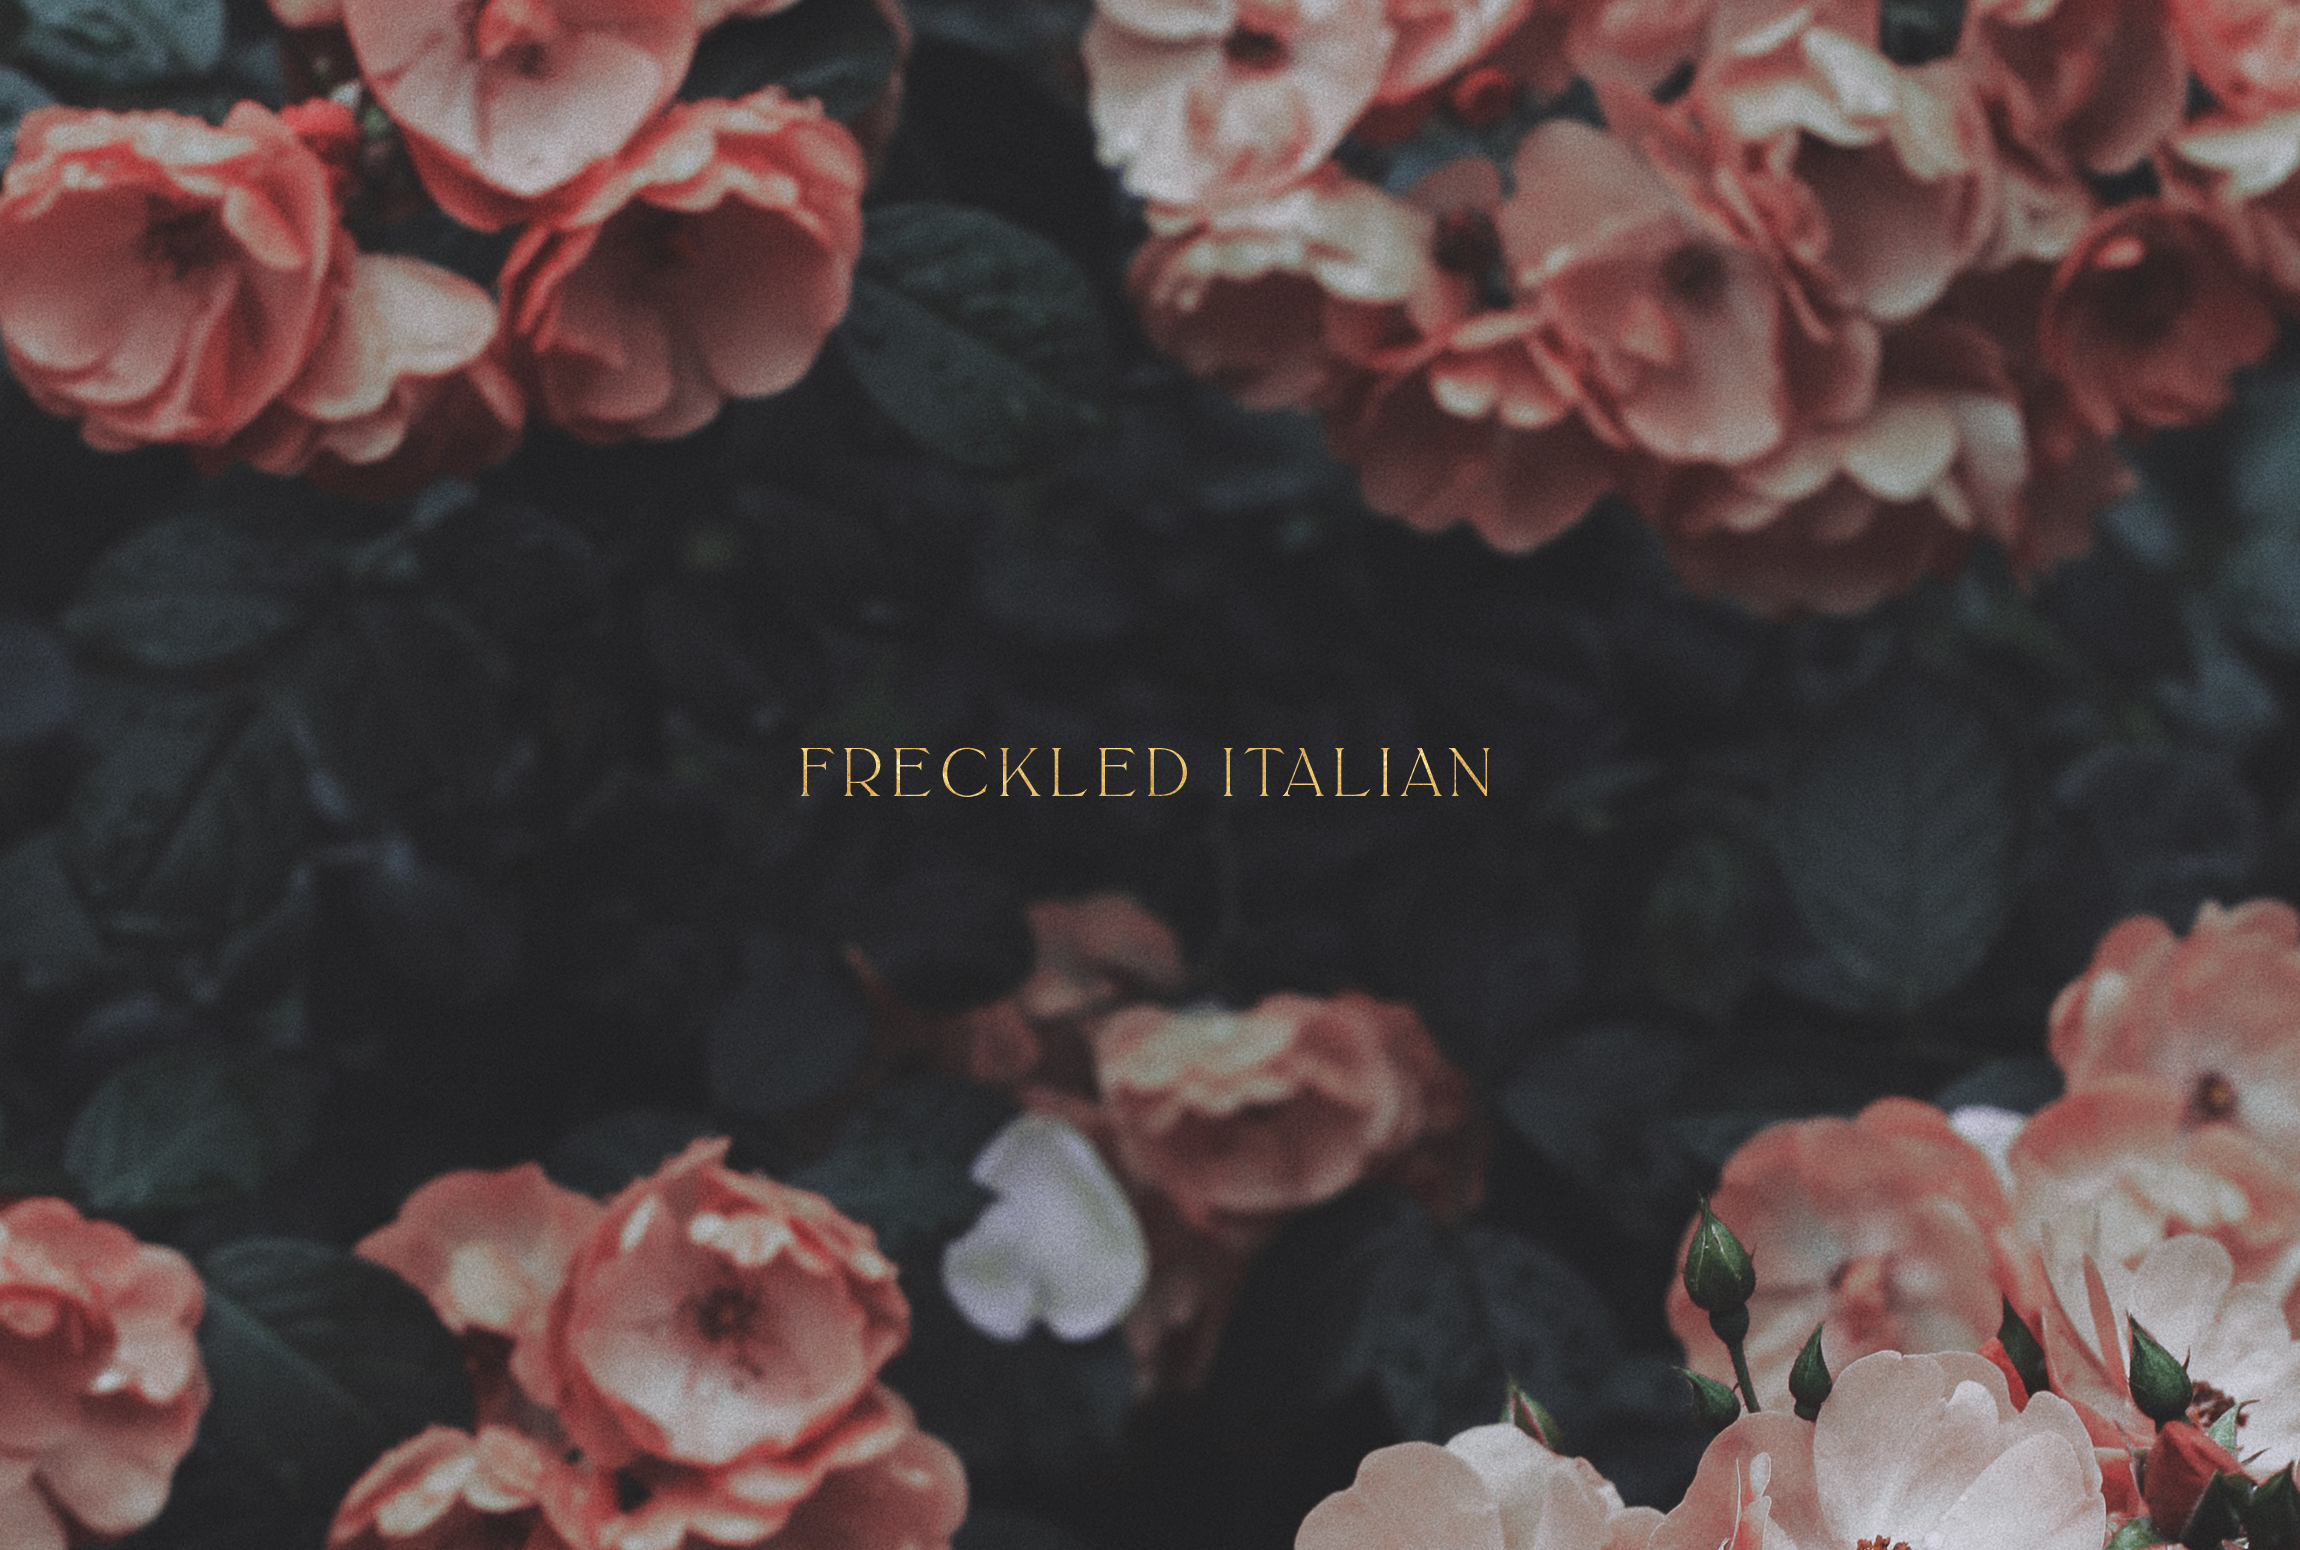 Freckled Italian